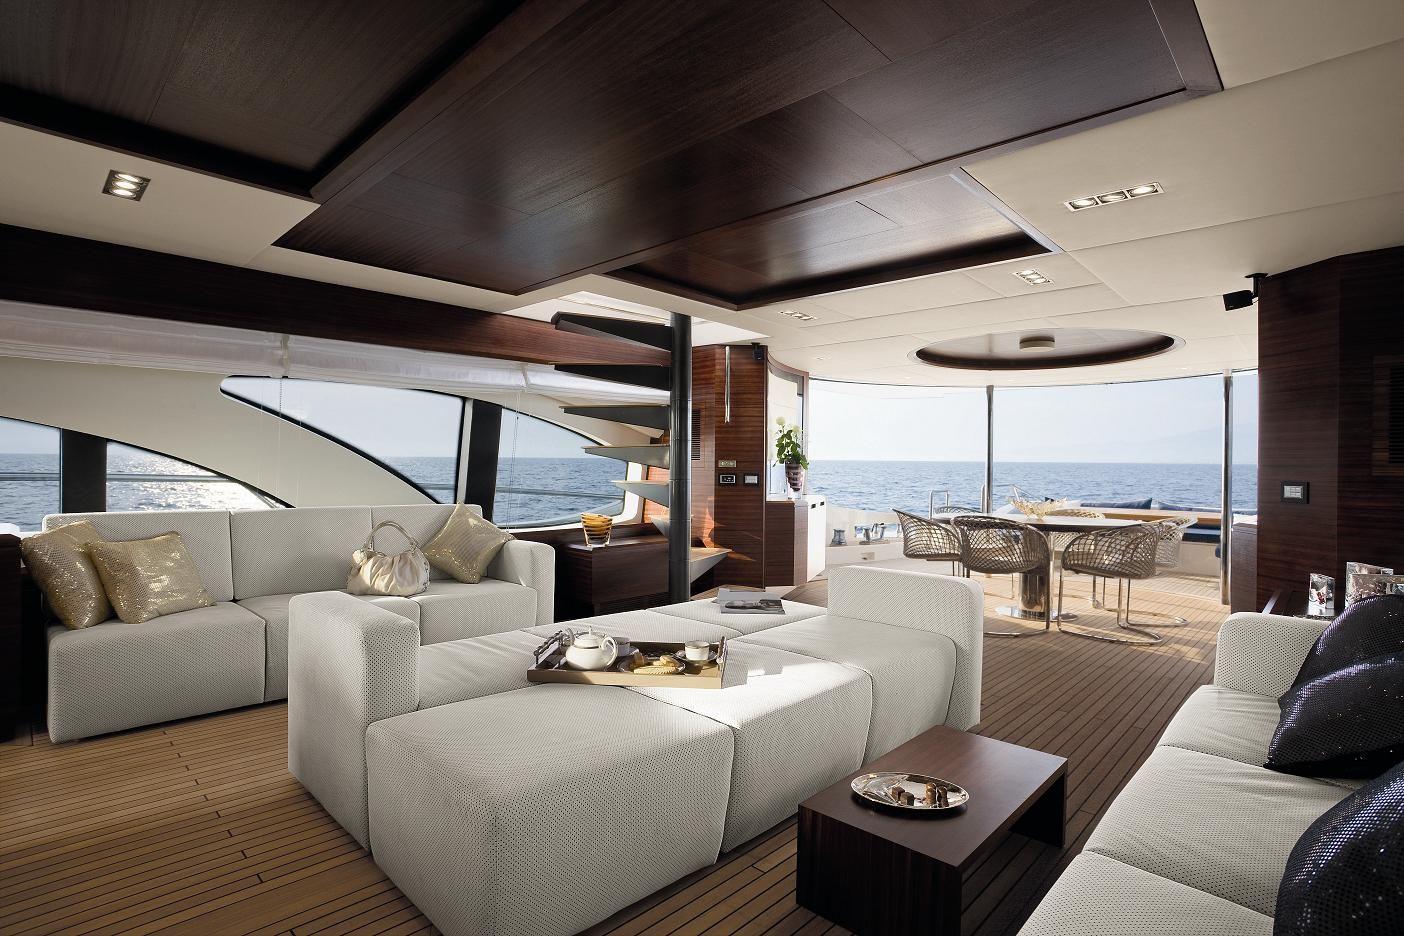 Azimut Leonardo 100 Yacht Interiors In Alcantara